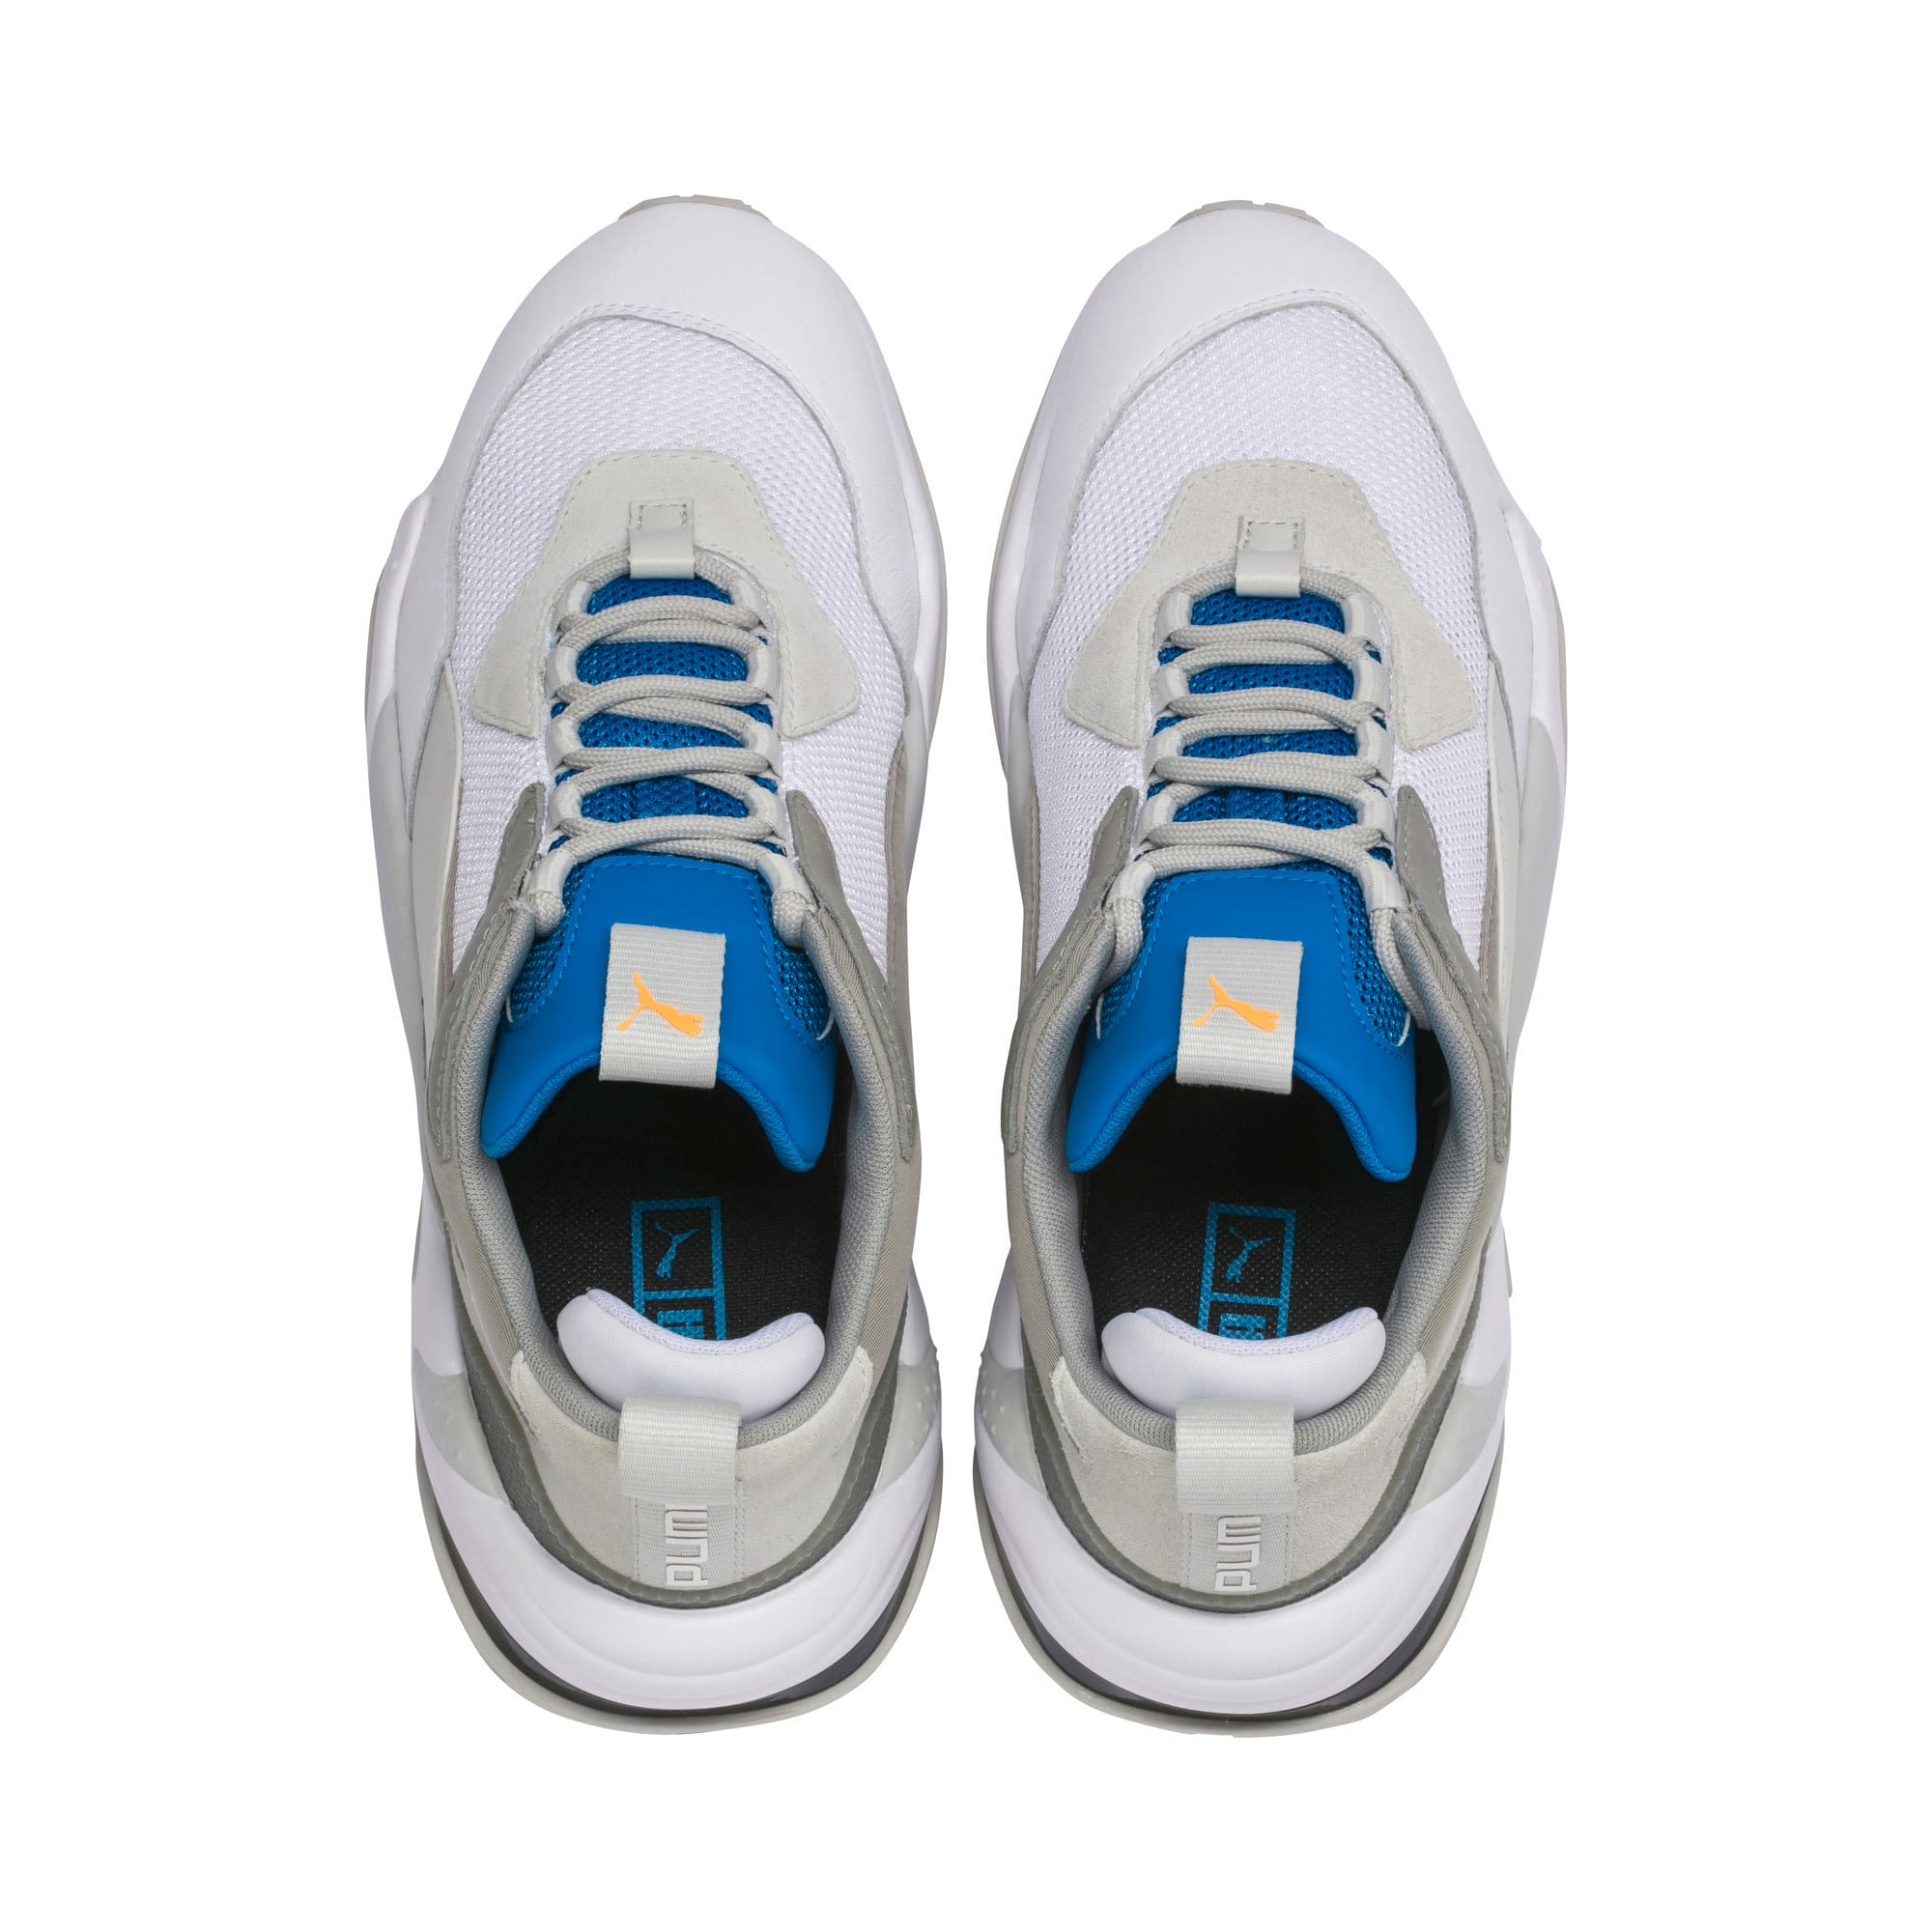 Thumbnail 6 of Thunder Spectra Sneakers, Glacier Gray-Indigo Bunting, medium